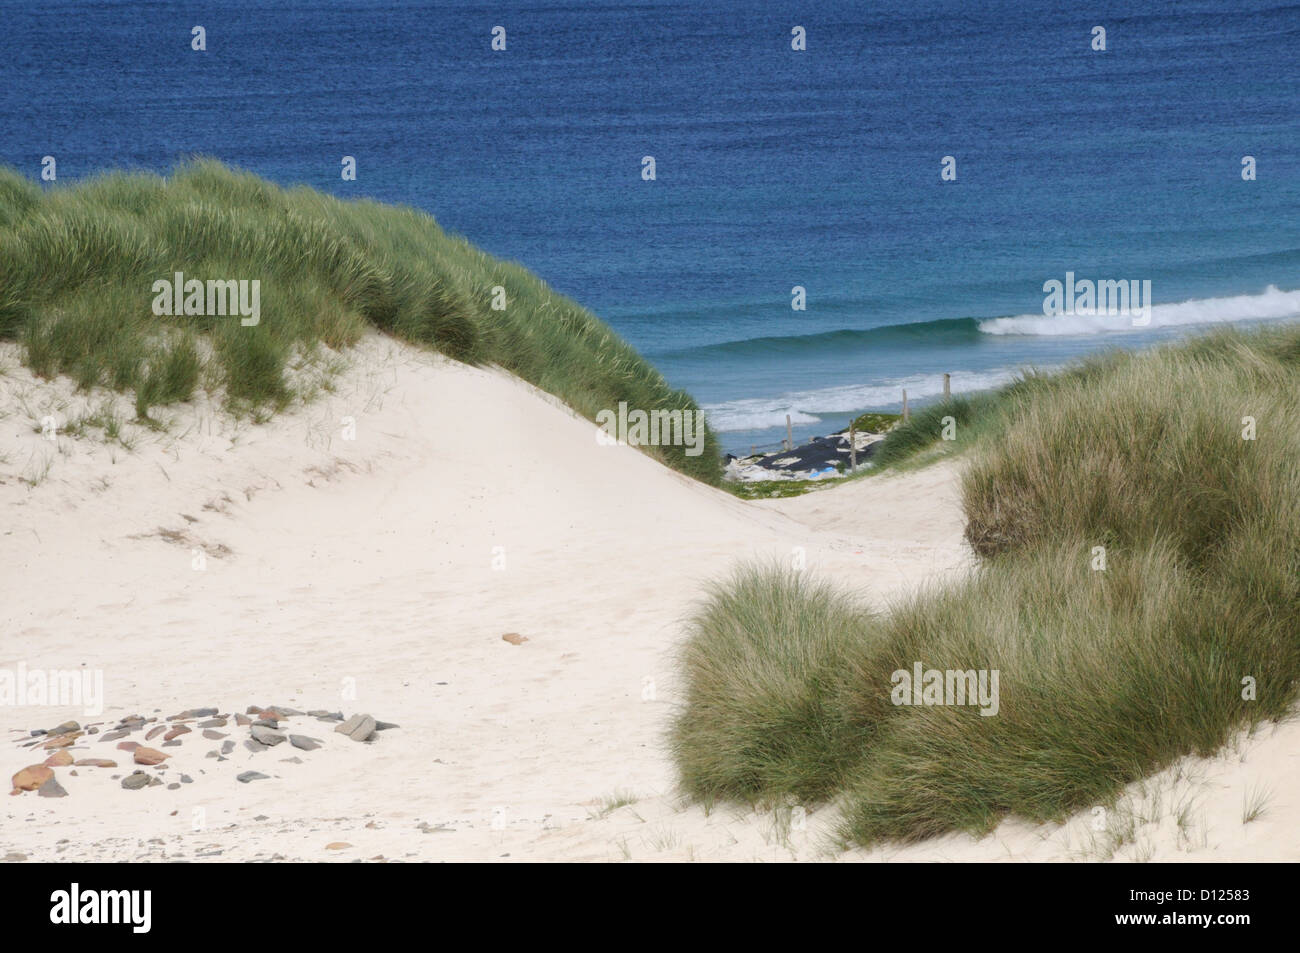 Marram grass growing  on sand dunes, Westray, Orkney, Scotland, UK. 30Jun10 - Stock Image